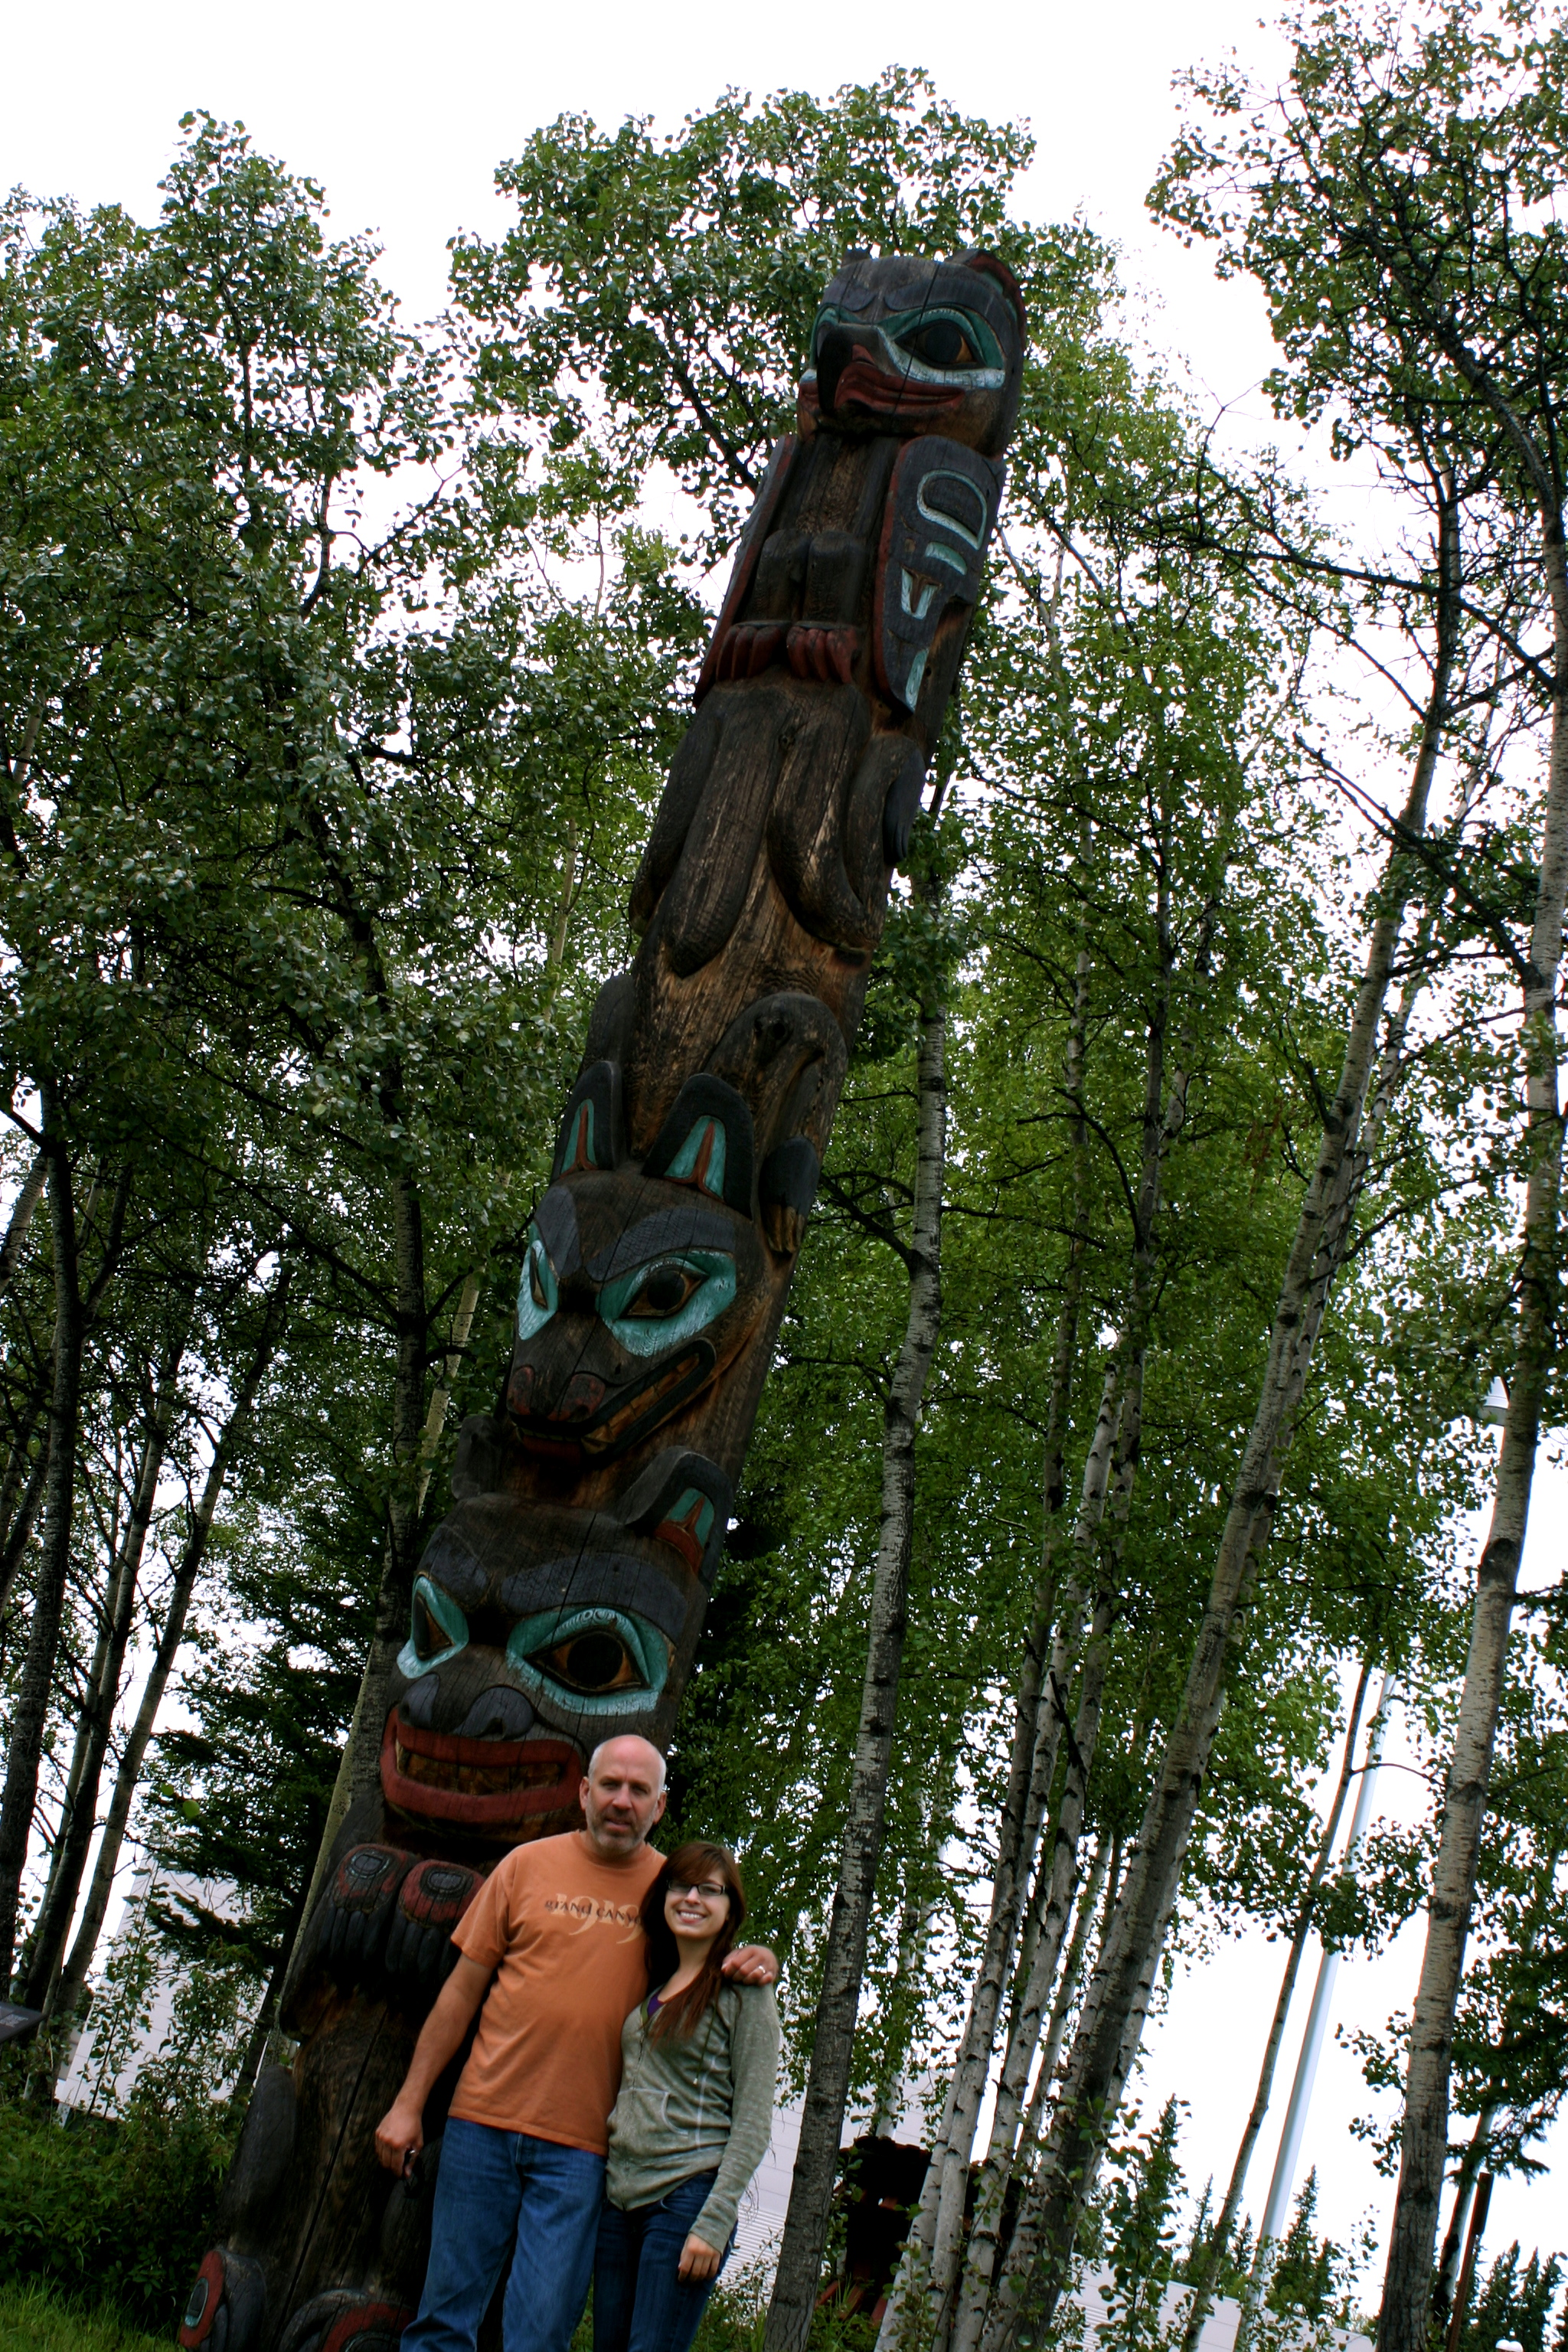 A REAL Totem Pole